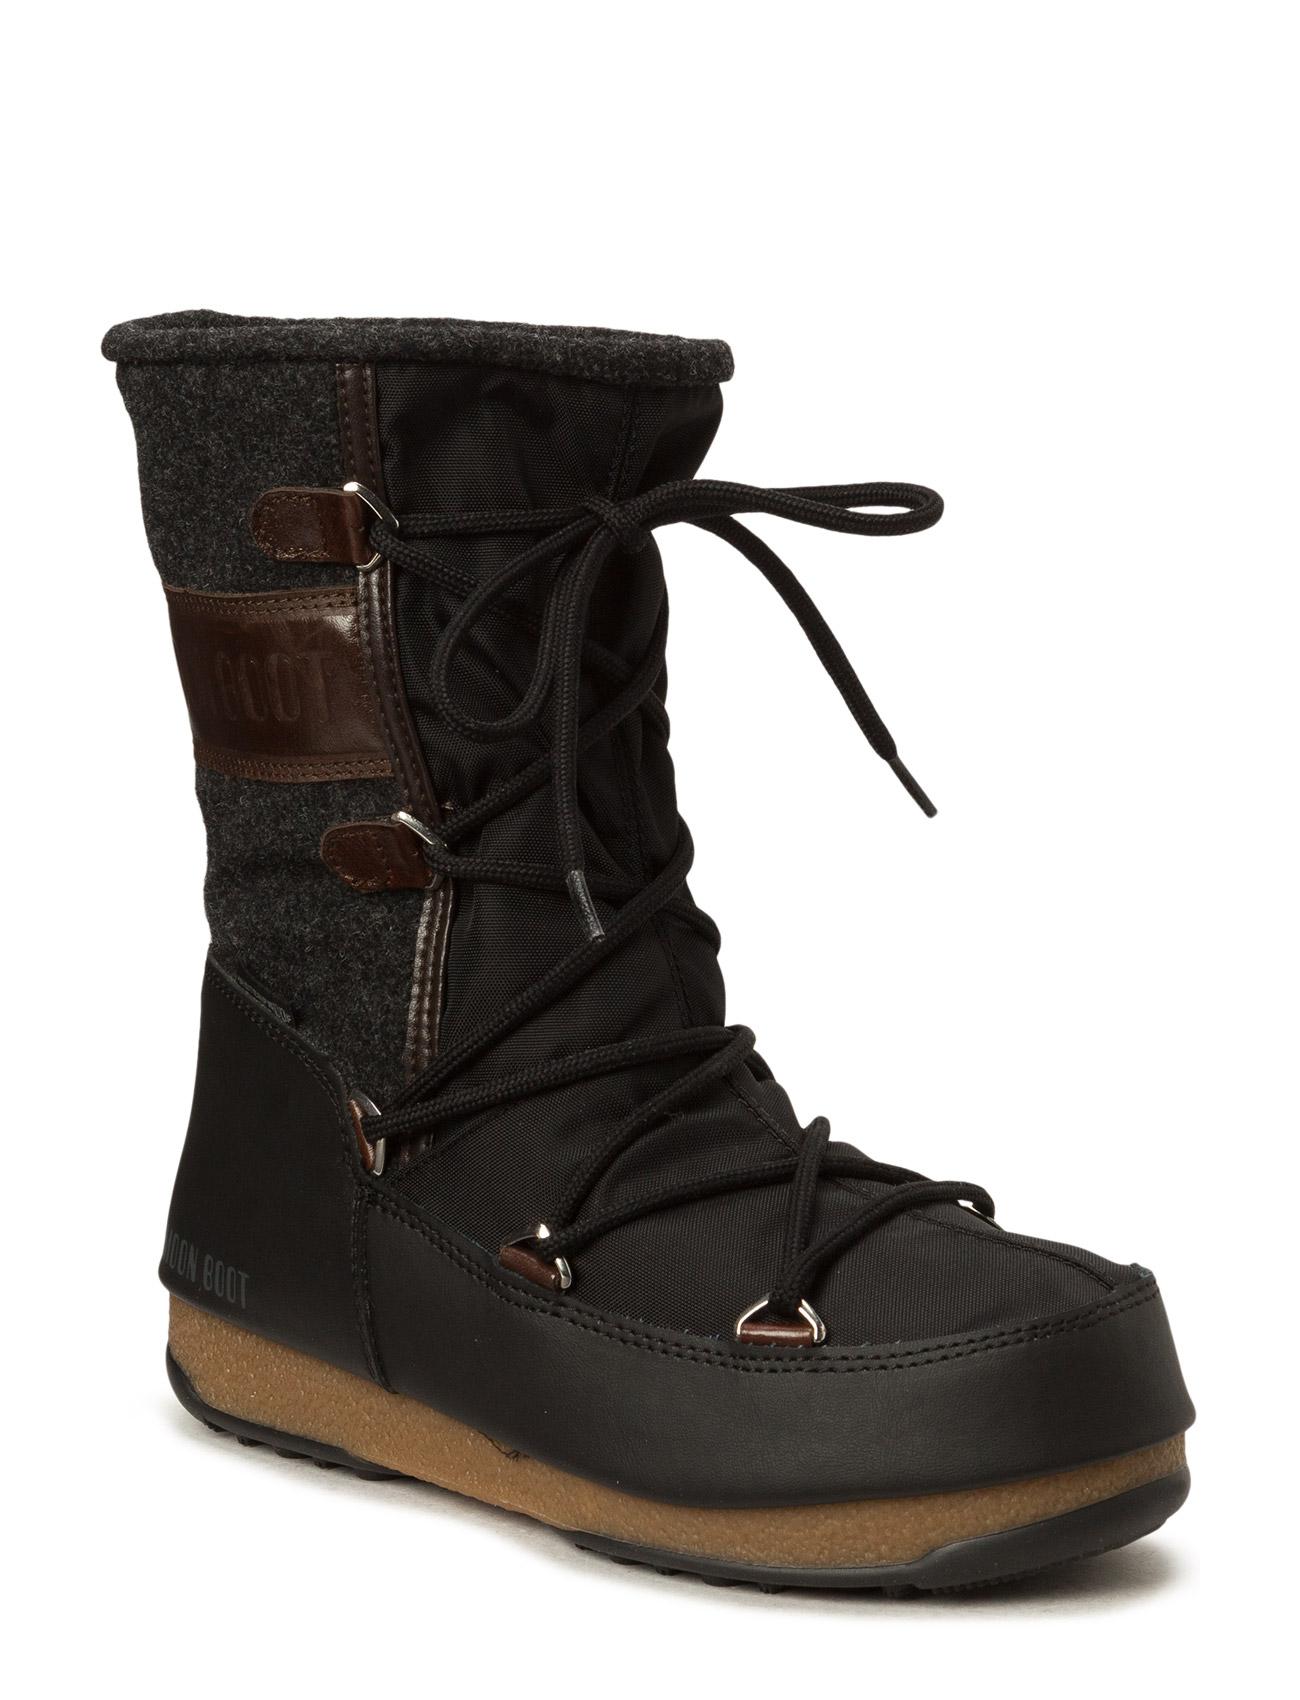 Mb Moon Boot W.E. Vienna Felt Moon Boot Sko til Unisex i